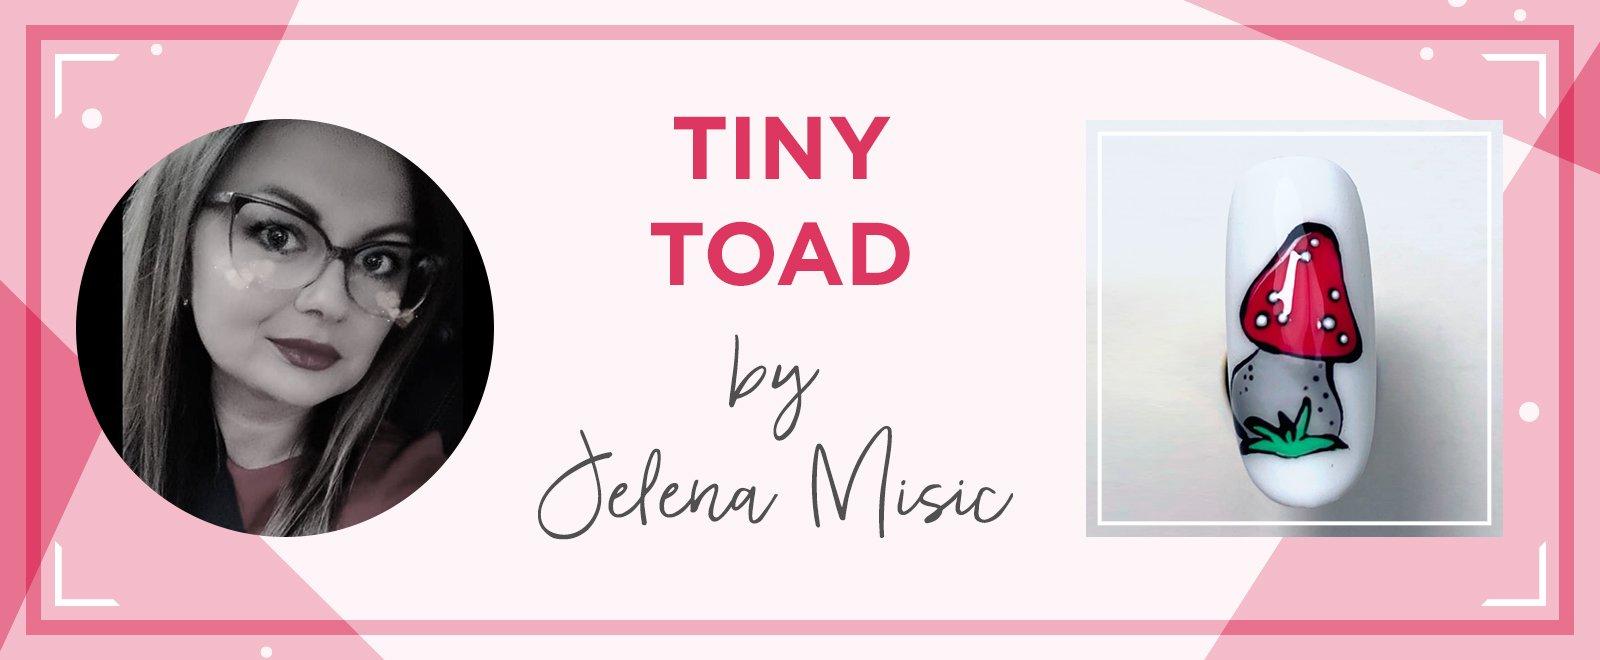 SBS_header_template_1600x660_Tiny-Toad_Jelena-Misic